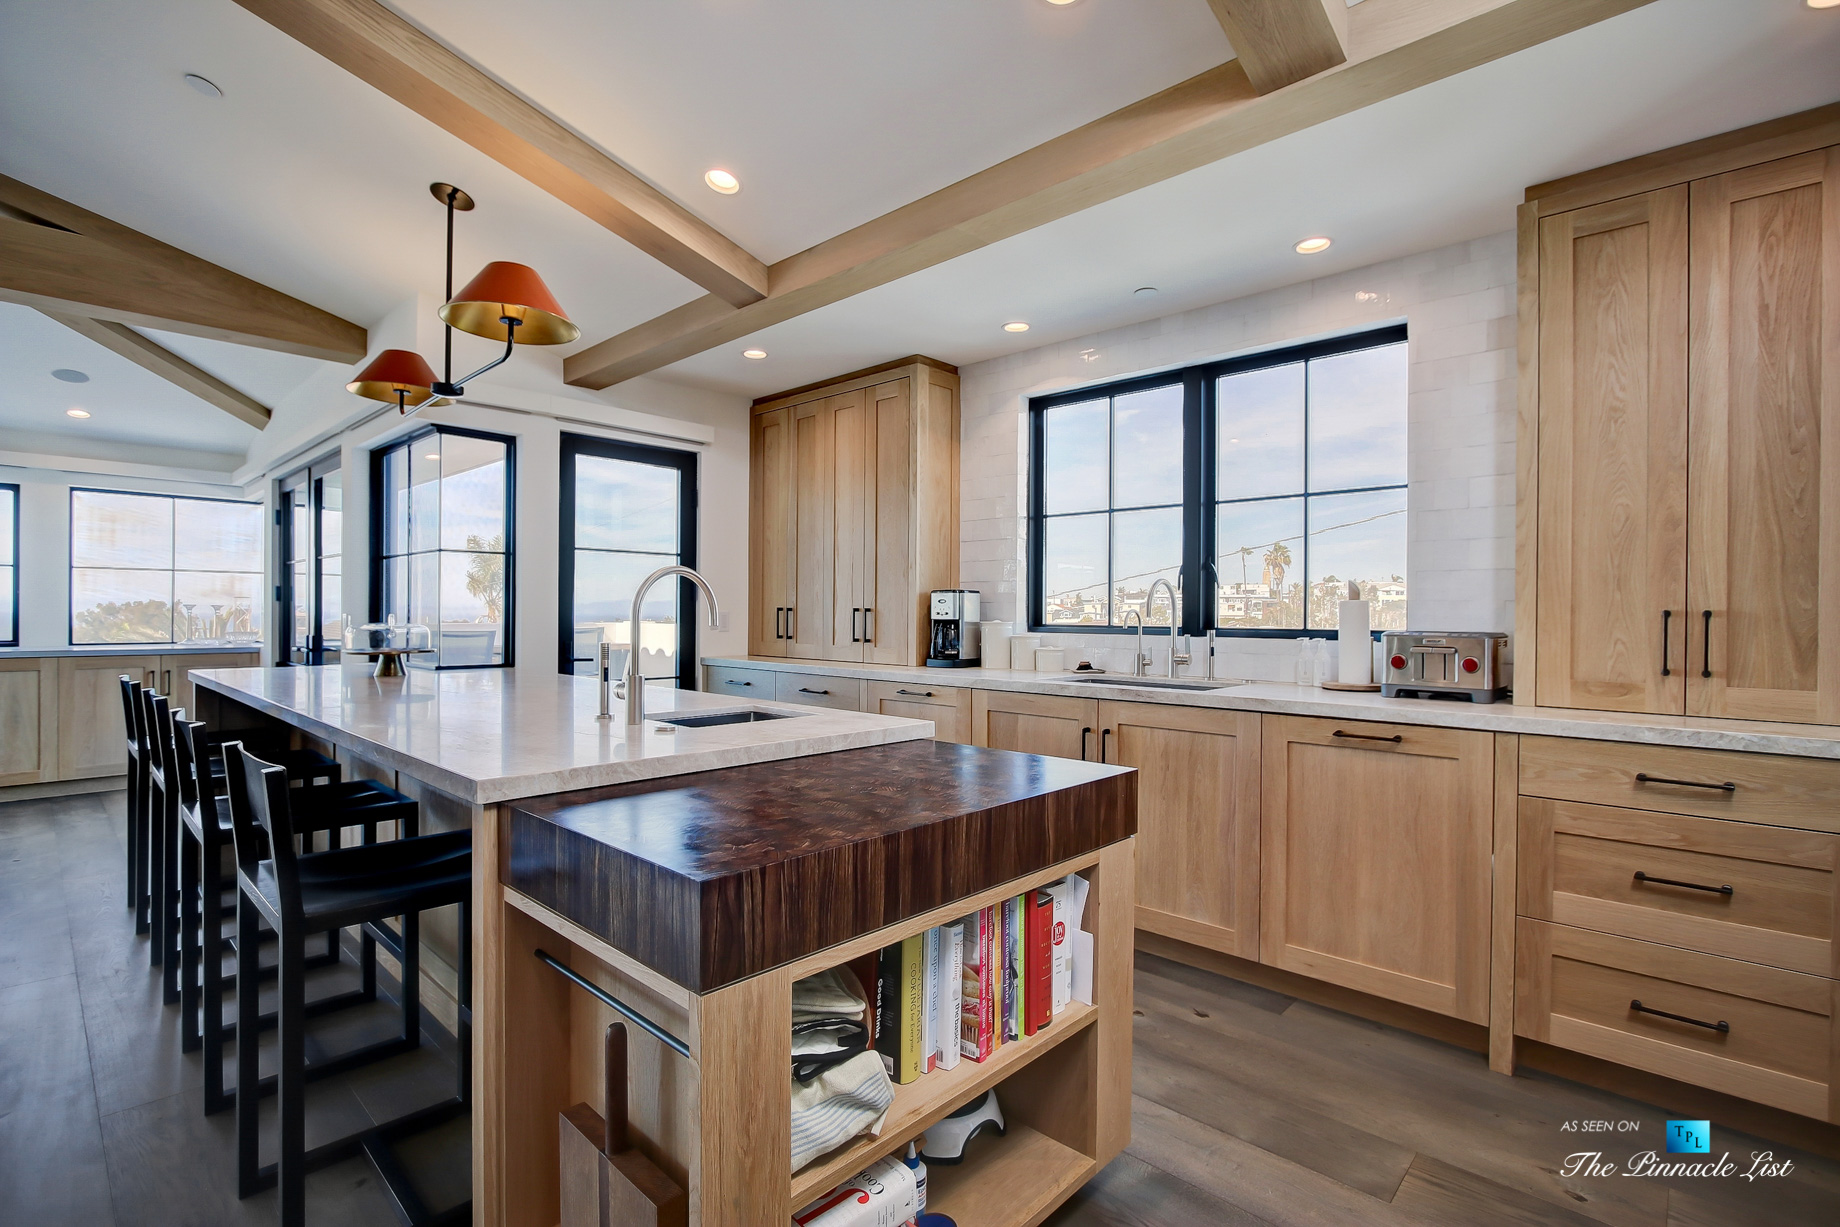 825 Highview Ave, Manhattan Beach, CA, USA - Kitchen Butcher Block Island - Luxury Real Estate - Modern Spanish Home